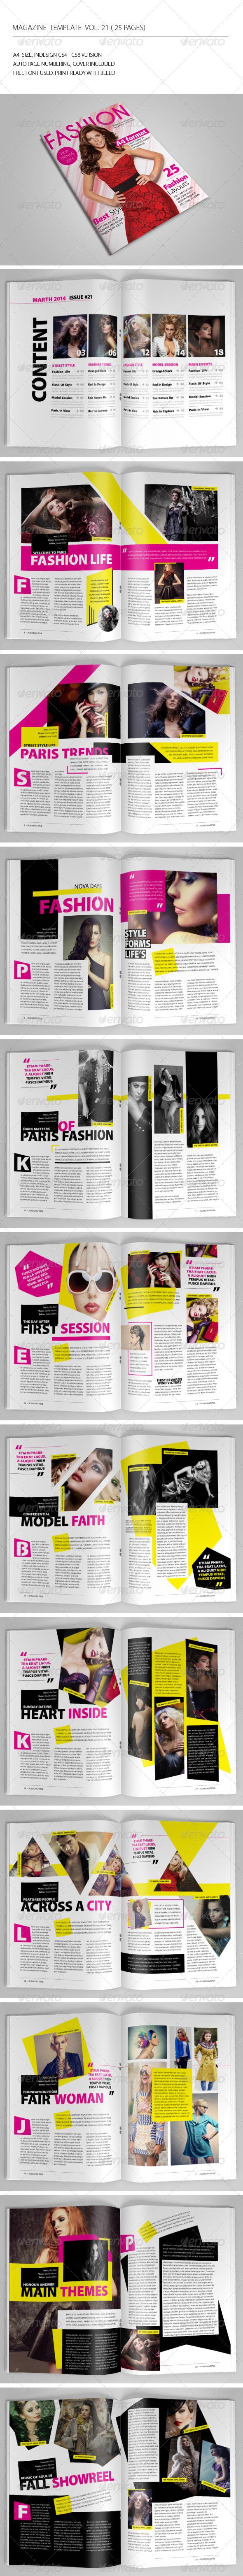 GraphicRiver 25 Pages Fashion Magazine Vol21 7053274